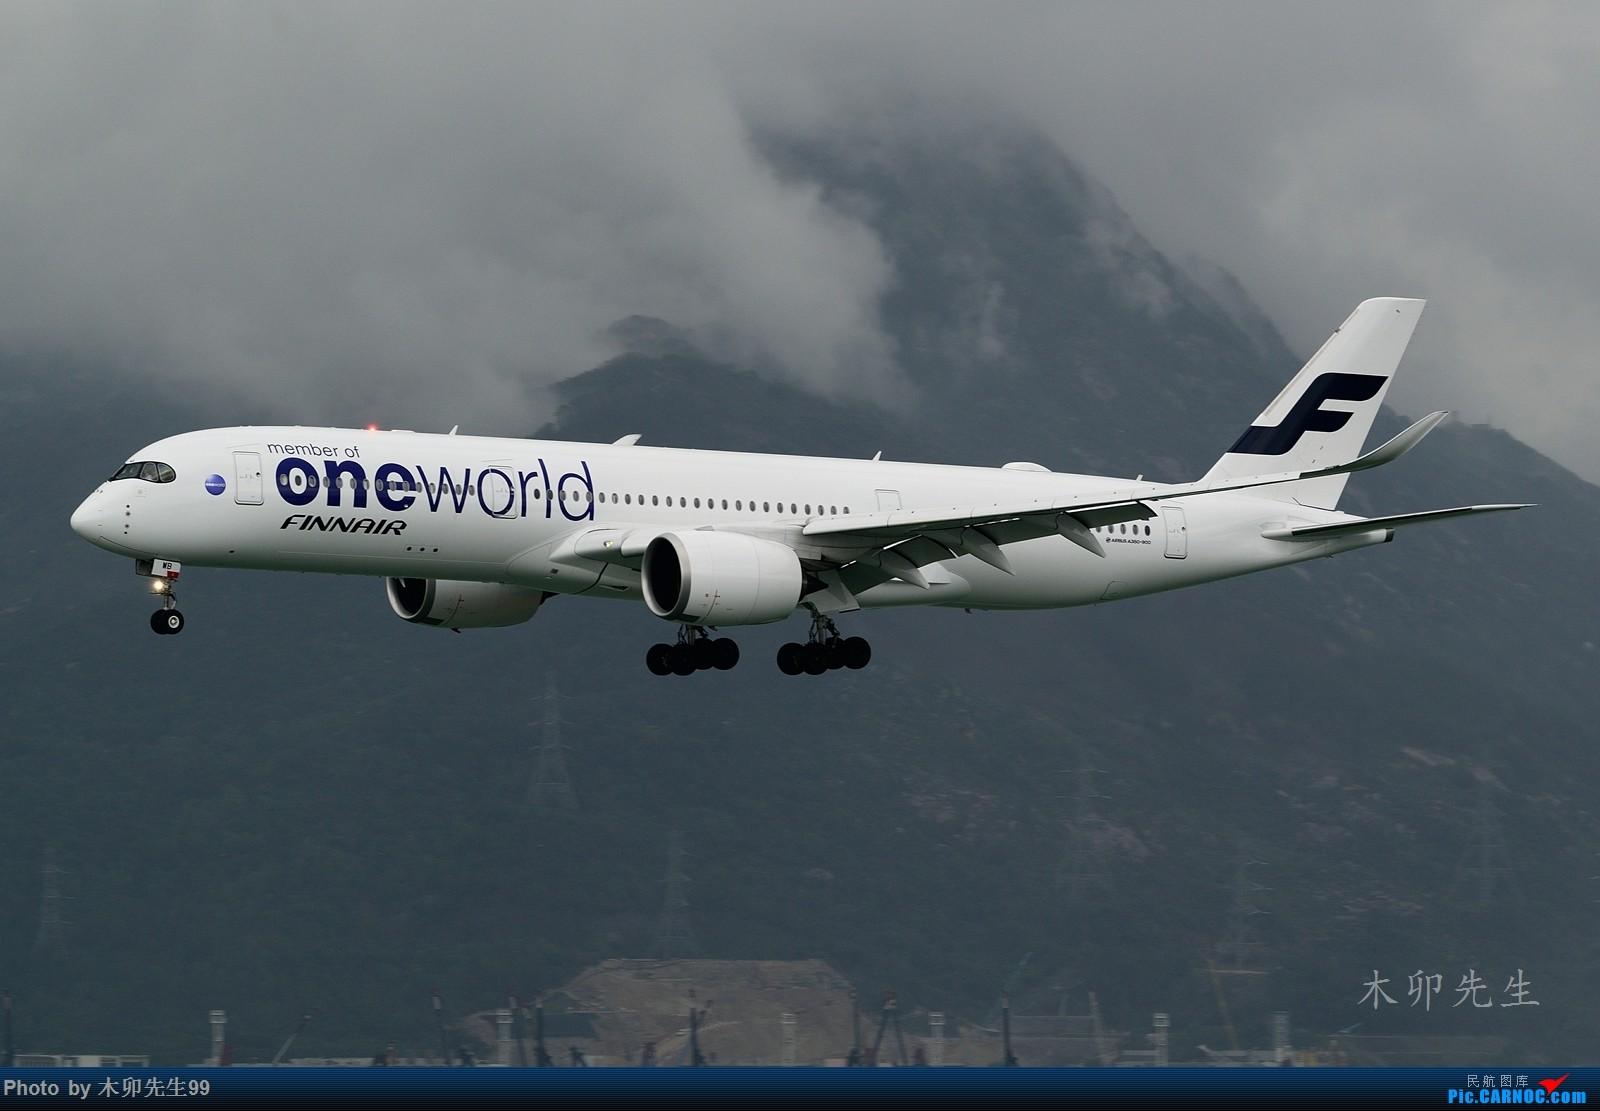 Re:[原创]【木卯先生99】—【2016年香港拍机新发现】—2016 AIRBUS A350-900 OH-LWB 香港赤鱲角国际机场